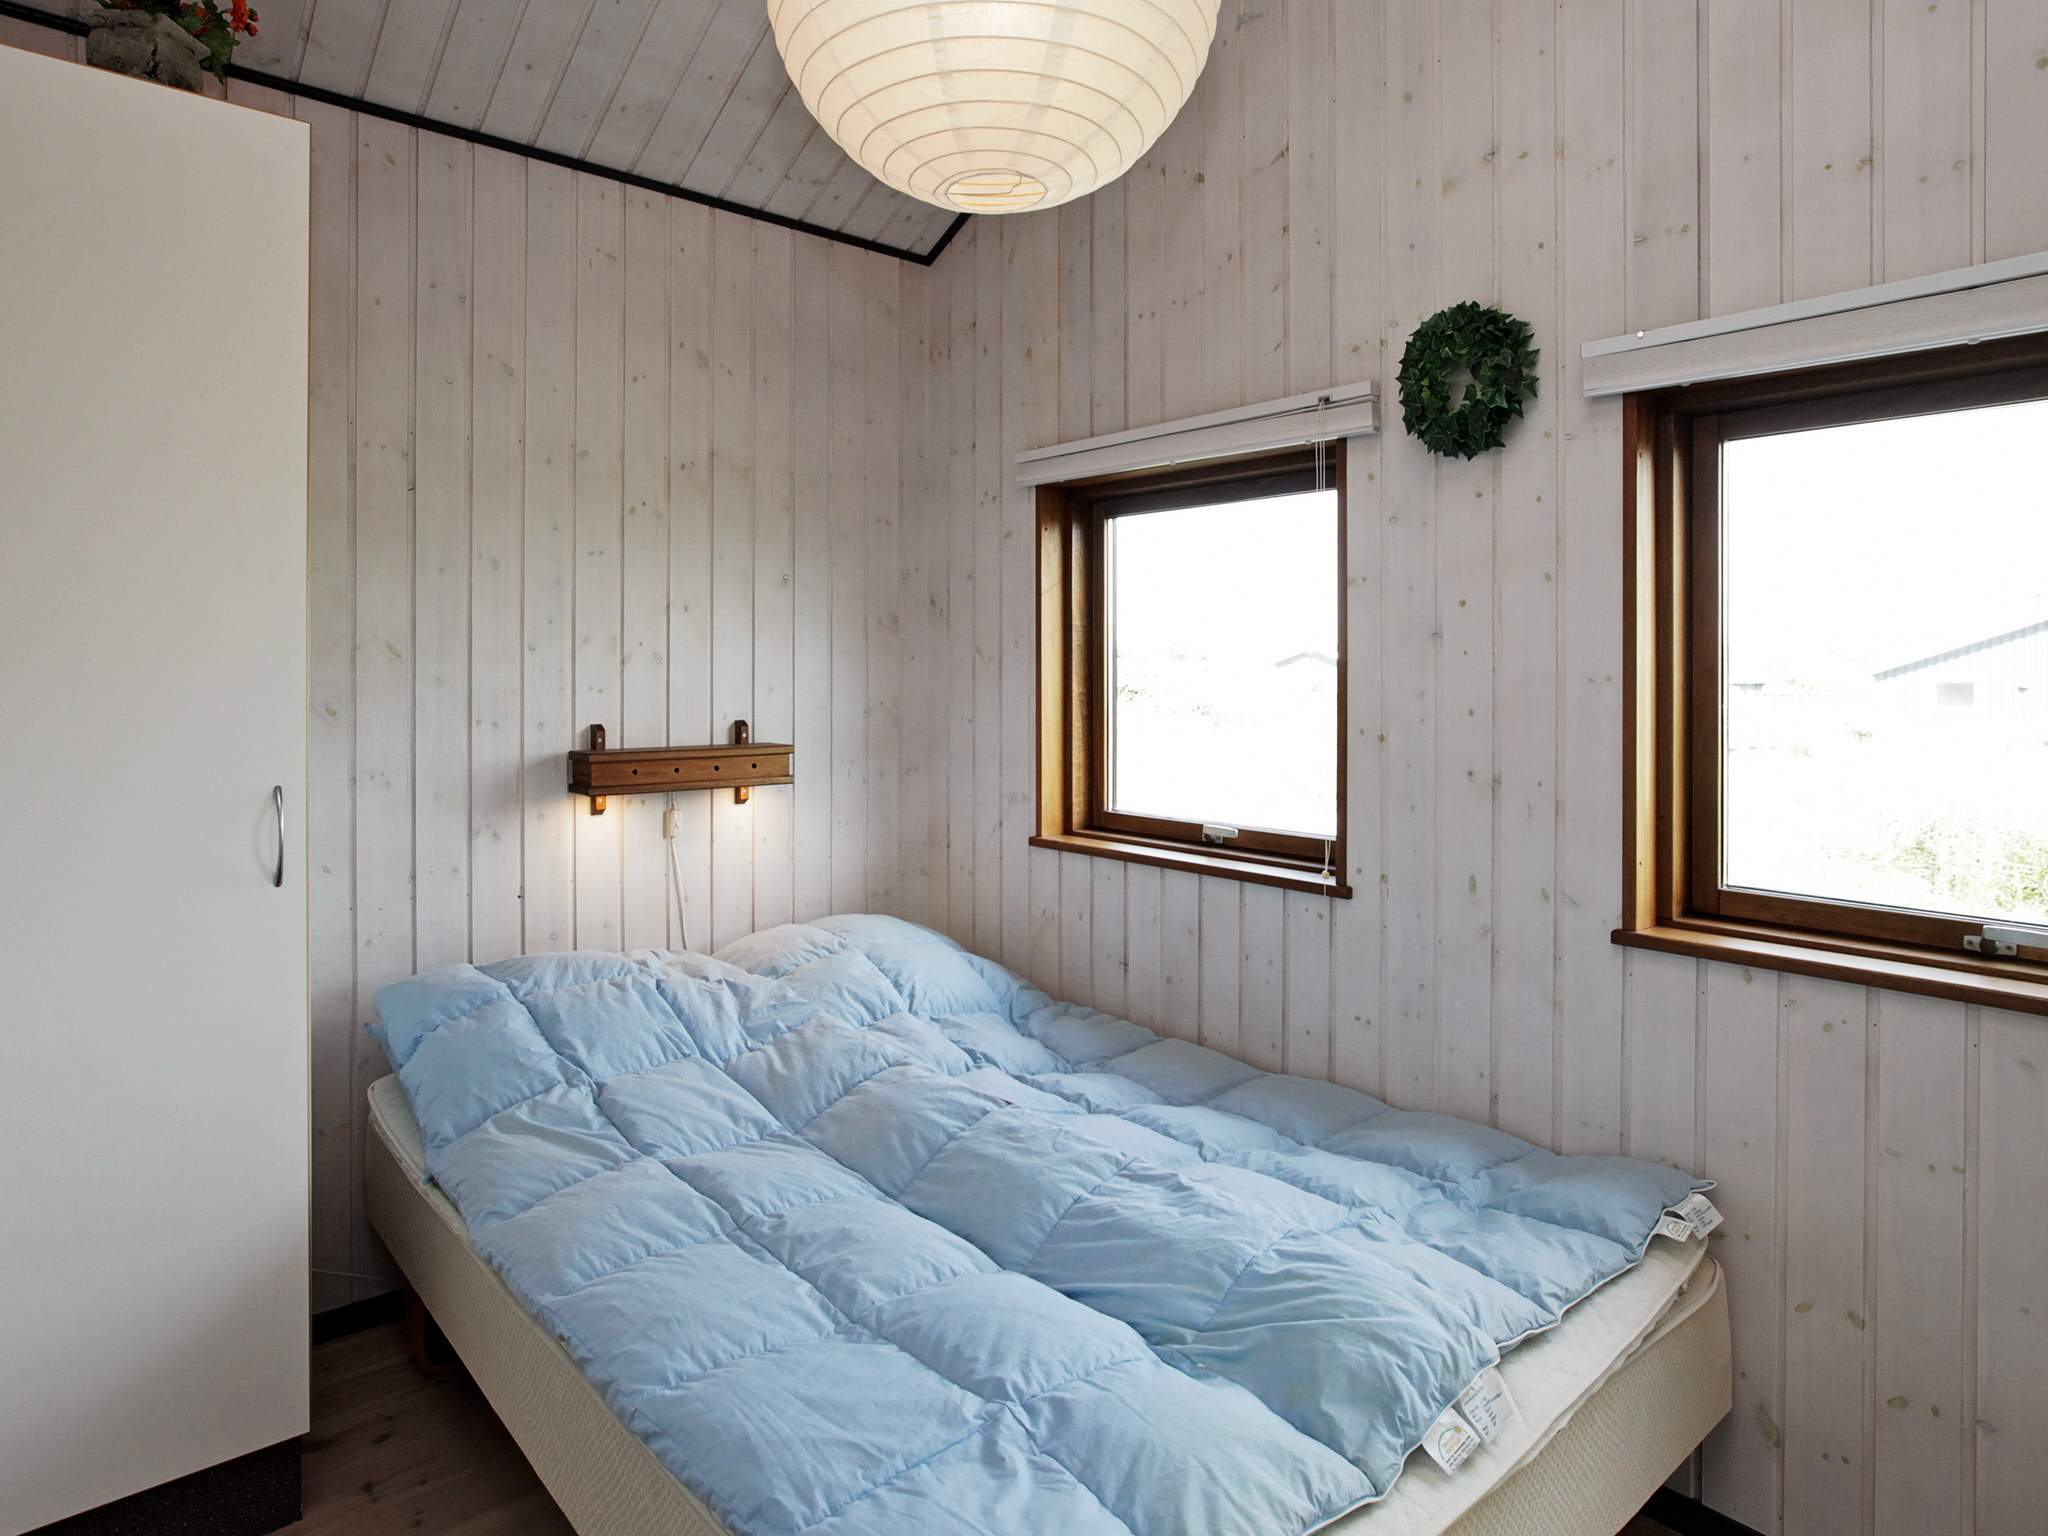 Ferienhaus Grønhøj Strand (84482), Løkken, , Nordwestjütland, Dänemark, Bild 9